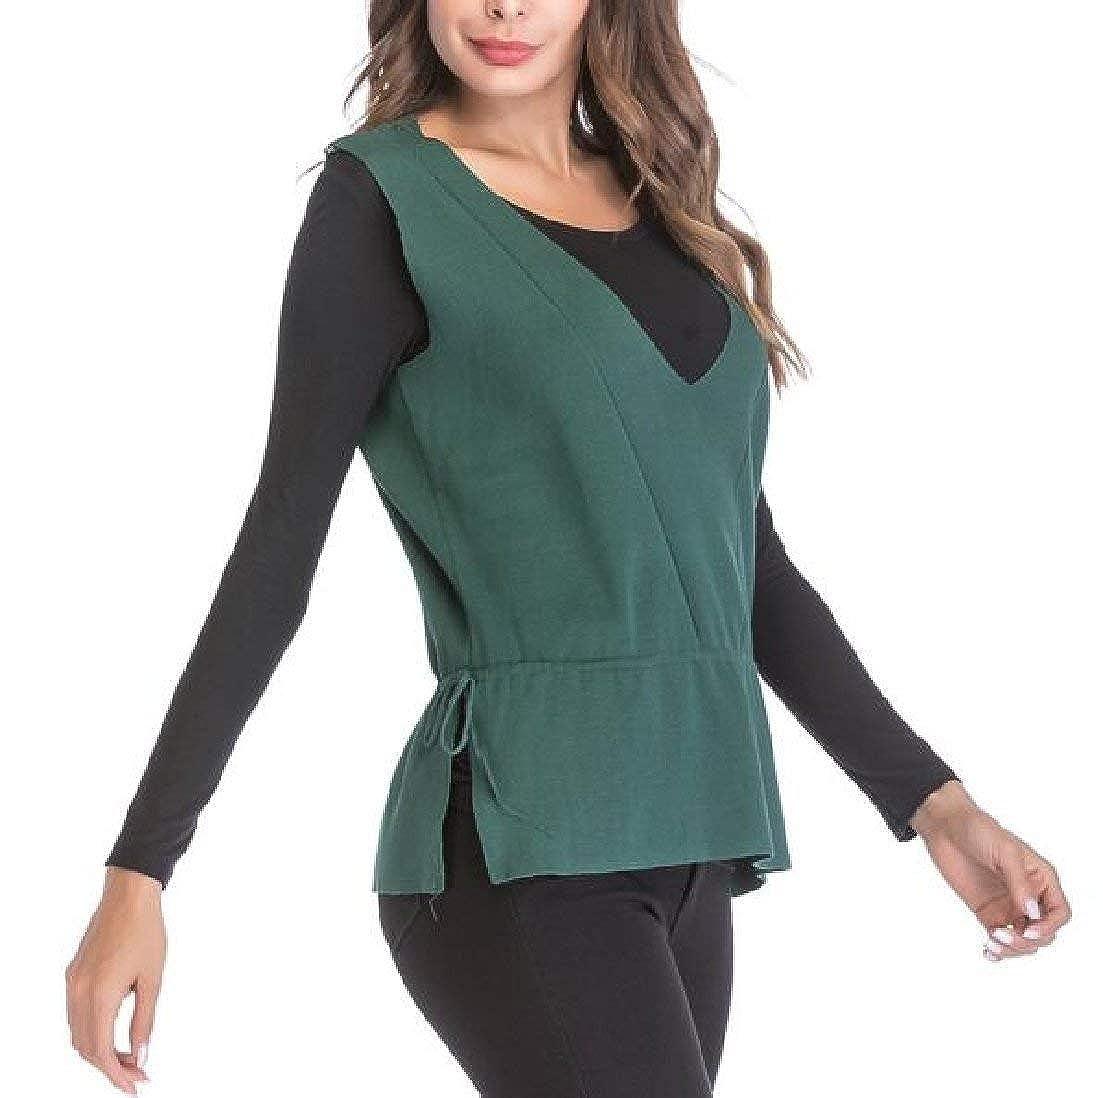 Alion Womens Fashion Sleeveless V Neck Waistcoat Knit Sweater Vest